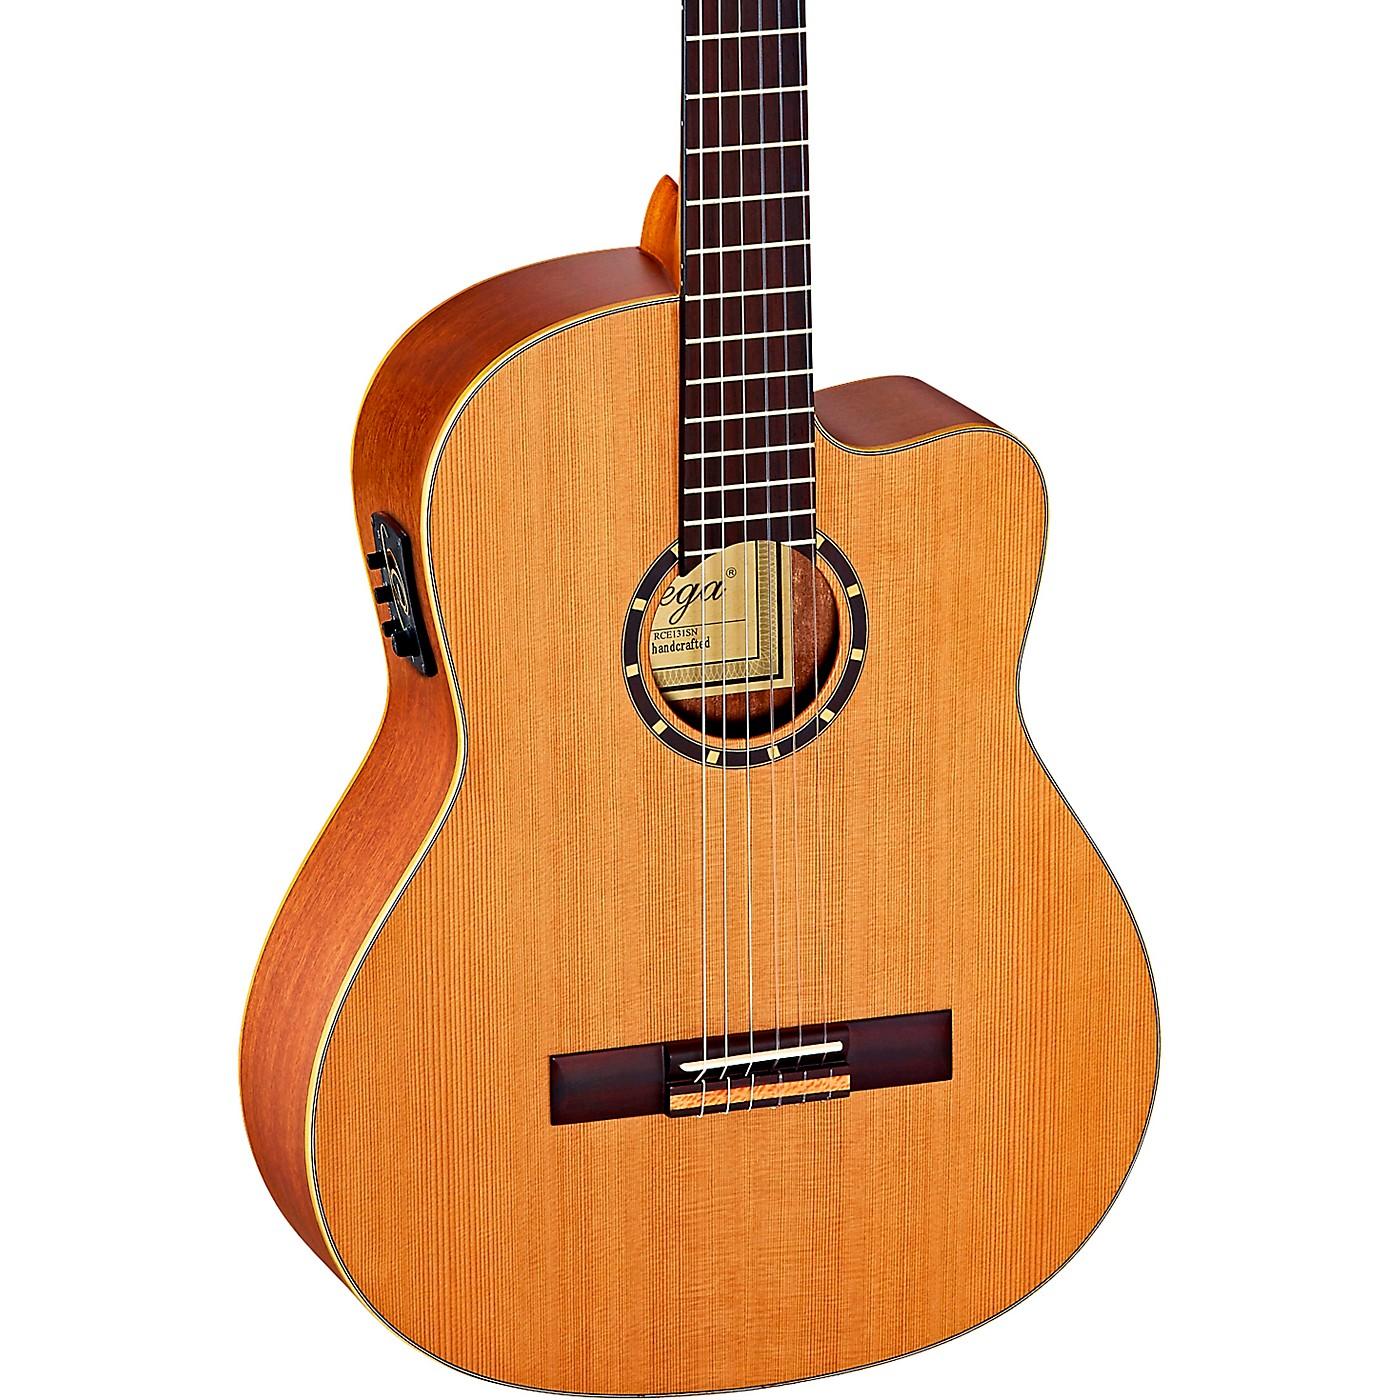 Ortega Family Series Pro RCE131 Acoustic-Electric Slim Neck Nylon String Guitar thumbnail